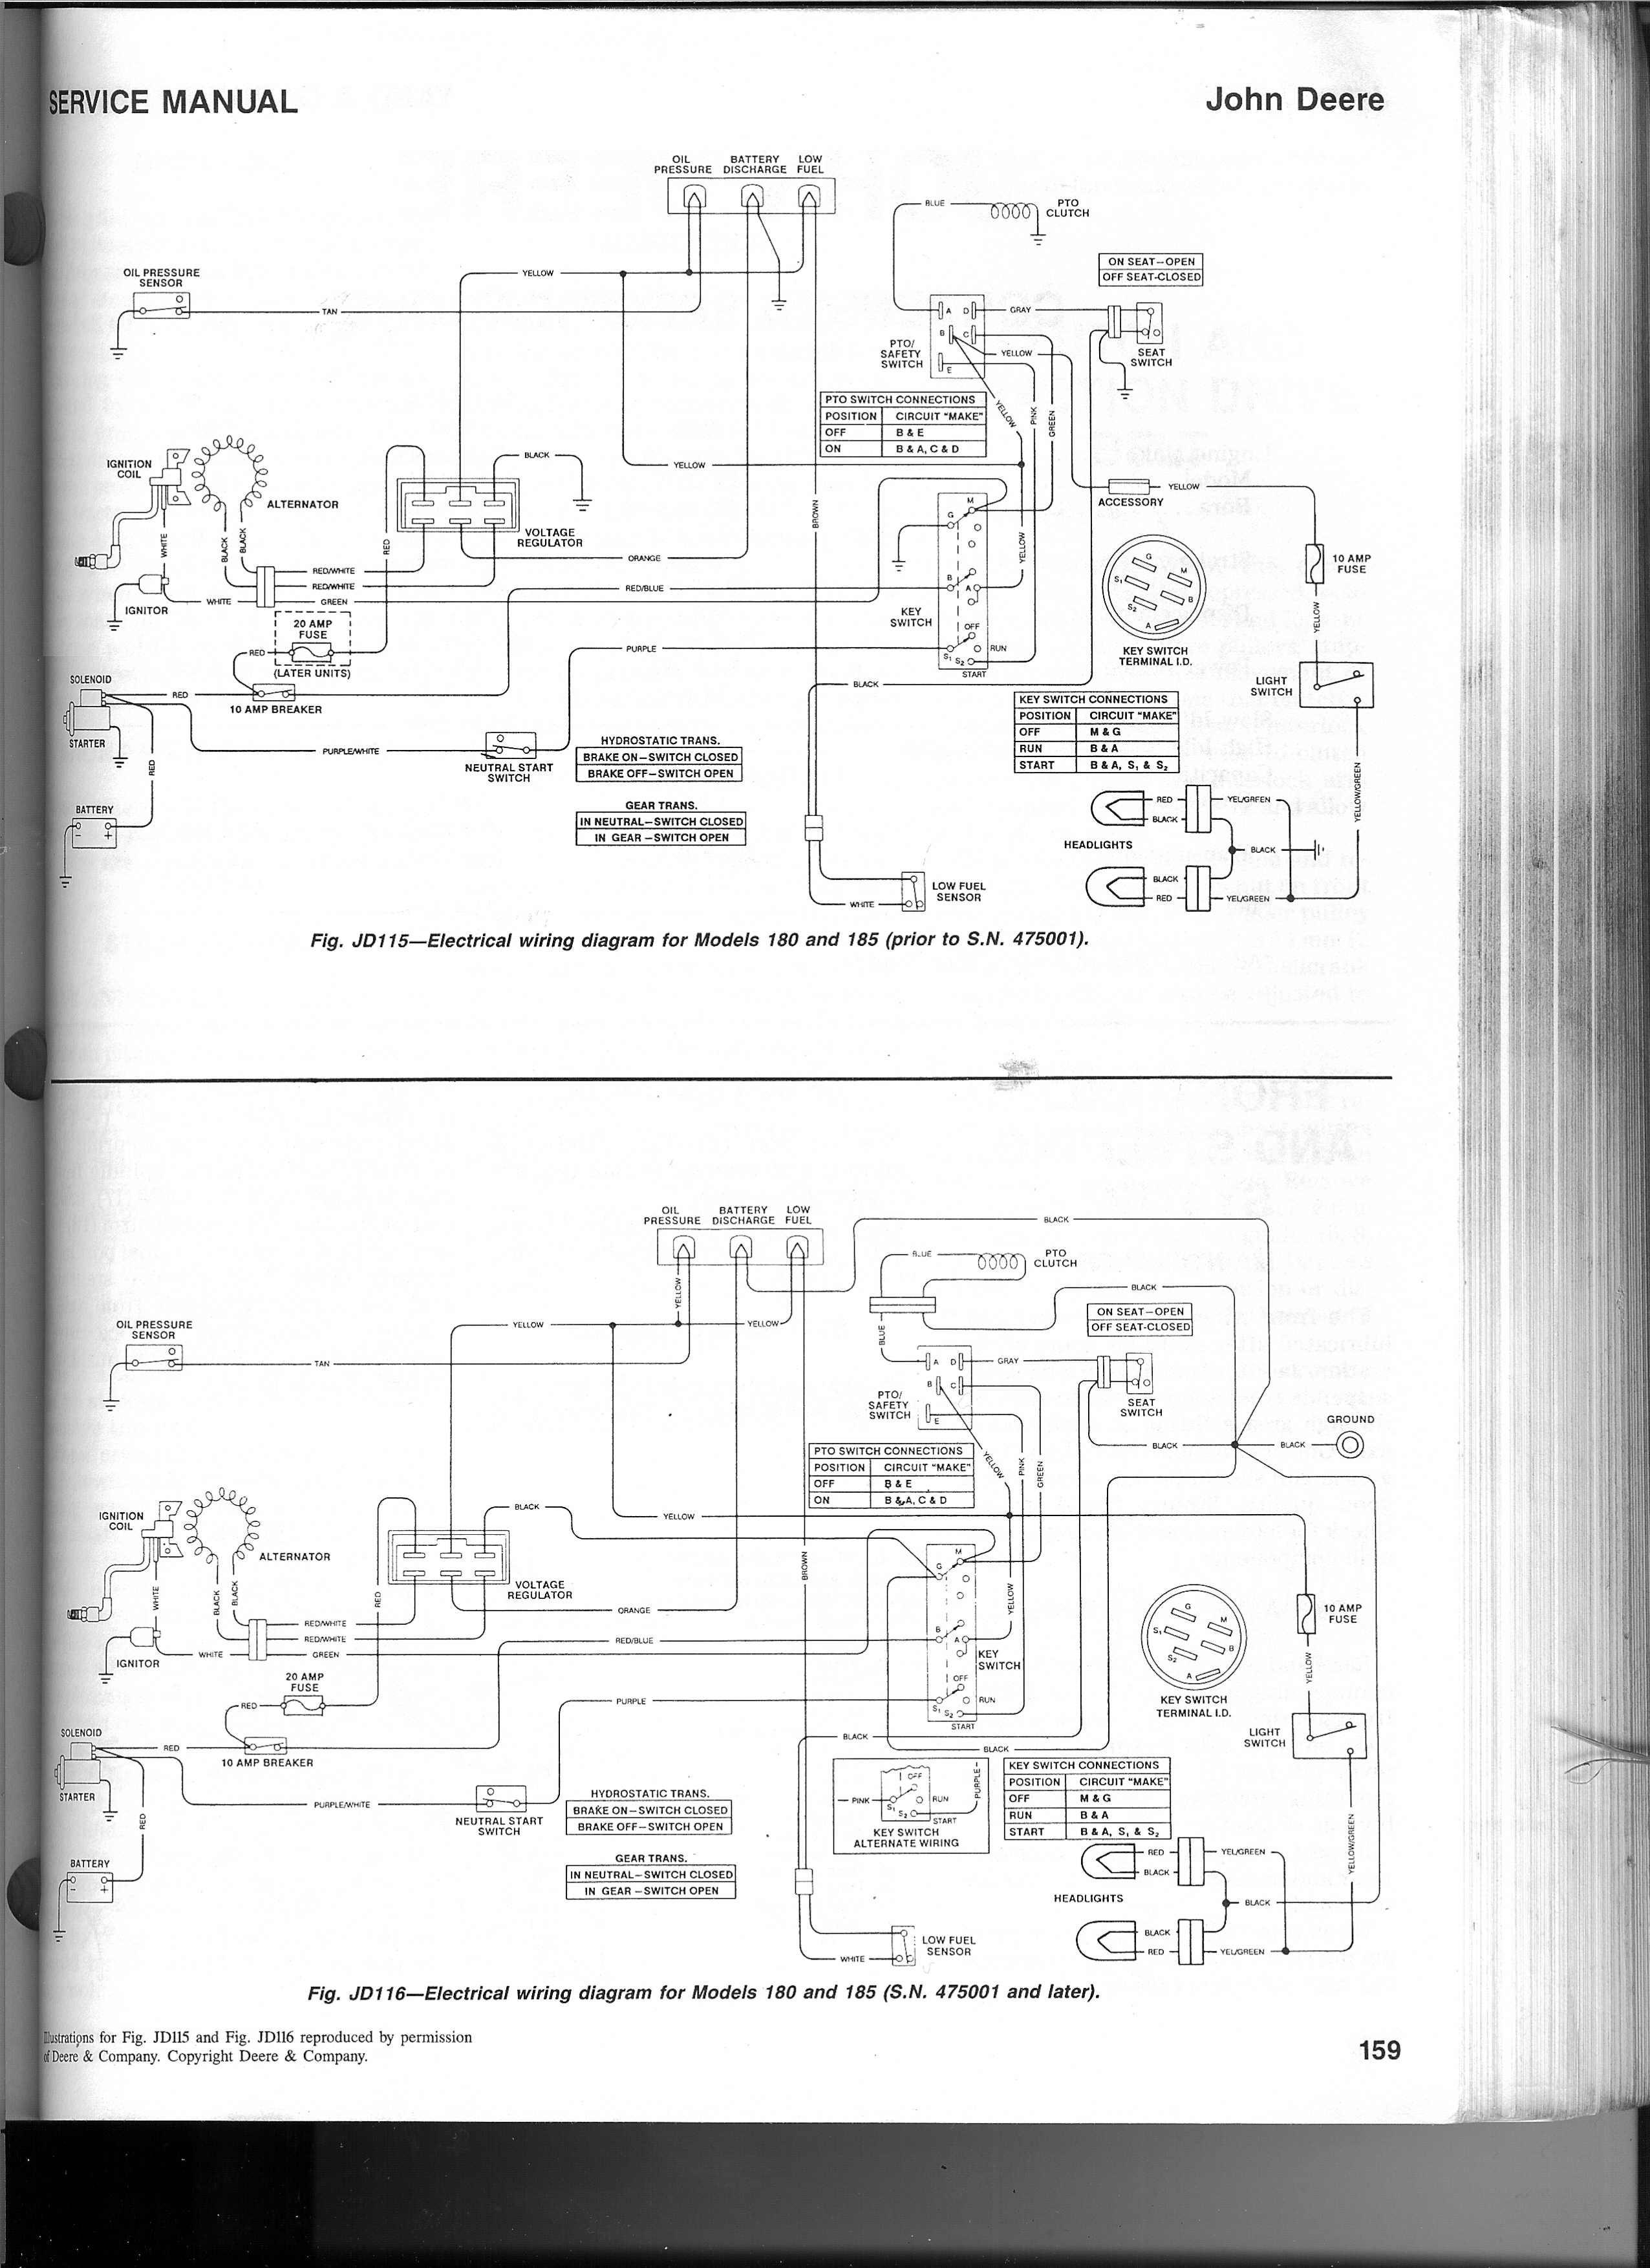 John Deere Gx345 Electrical Diagrams Dh 6213] John Deere Gt235 Wiring Diagram for Free Further Of John Deere Gx345 Electrical Diagrams